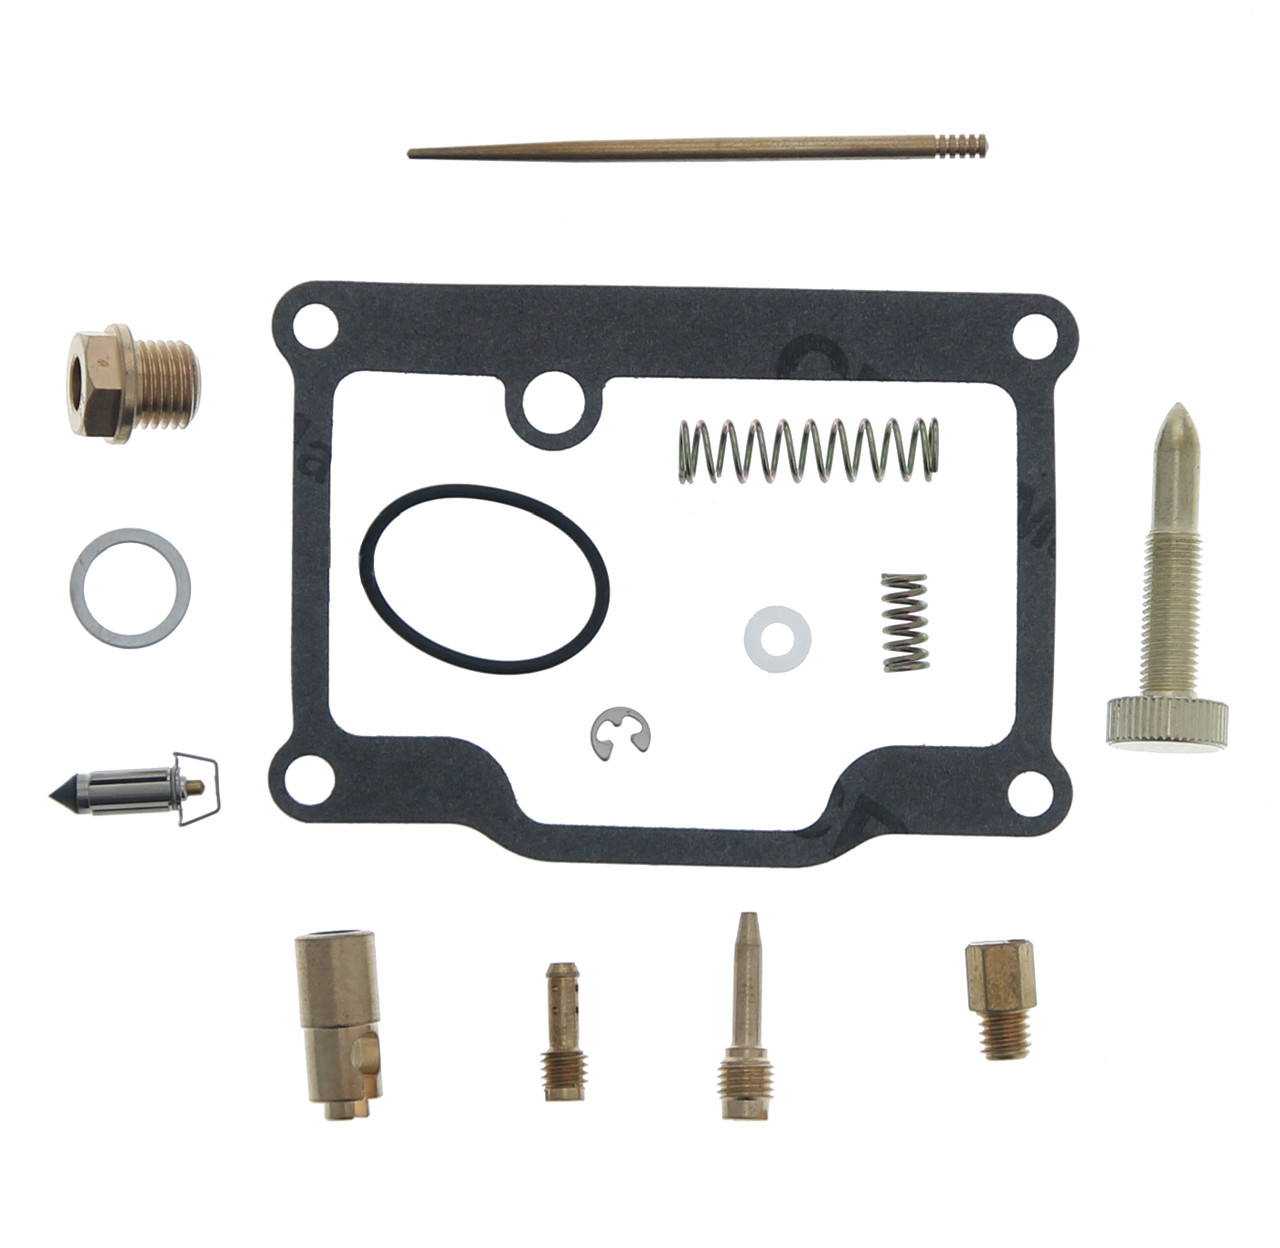 Carburetor Repair Kit Carb Kit fits Polaris 300 Xplorer 300 4x4 1996 - 1999